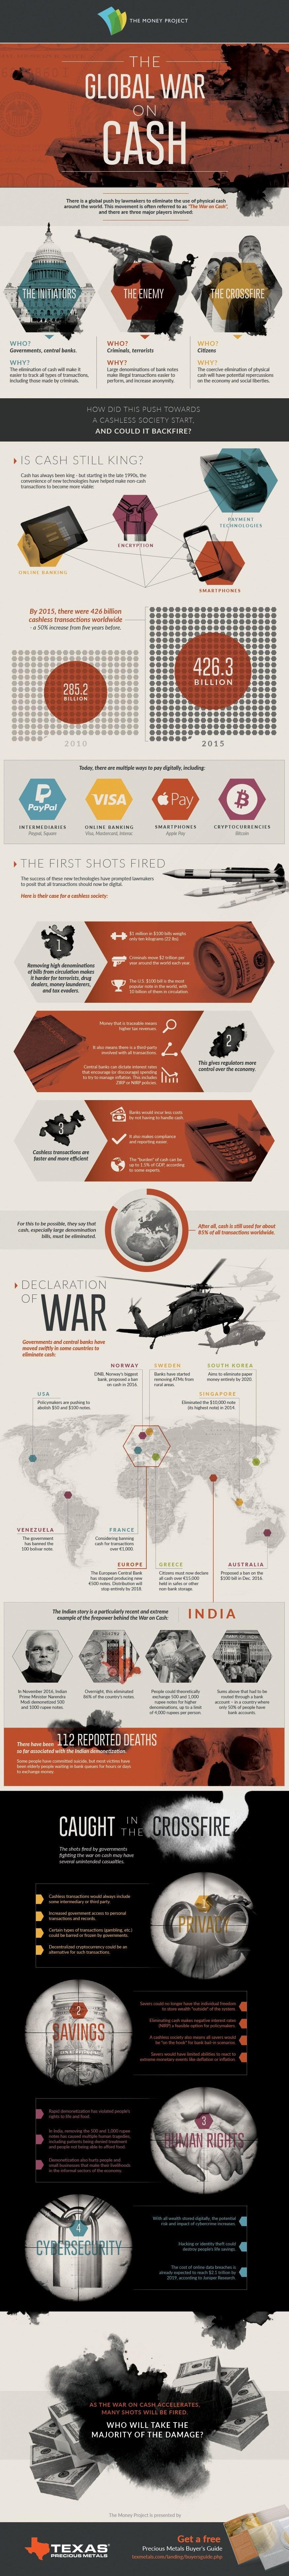 The Global War on Cash